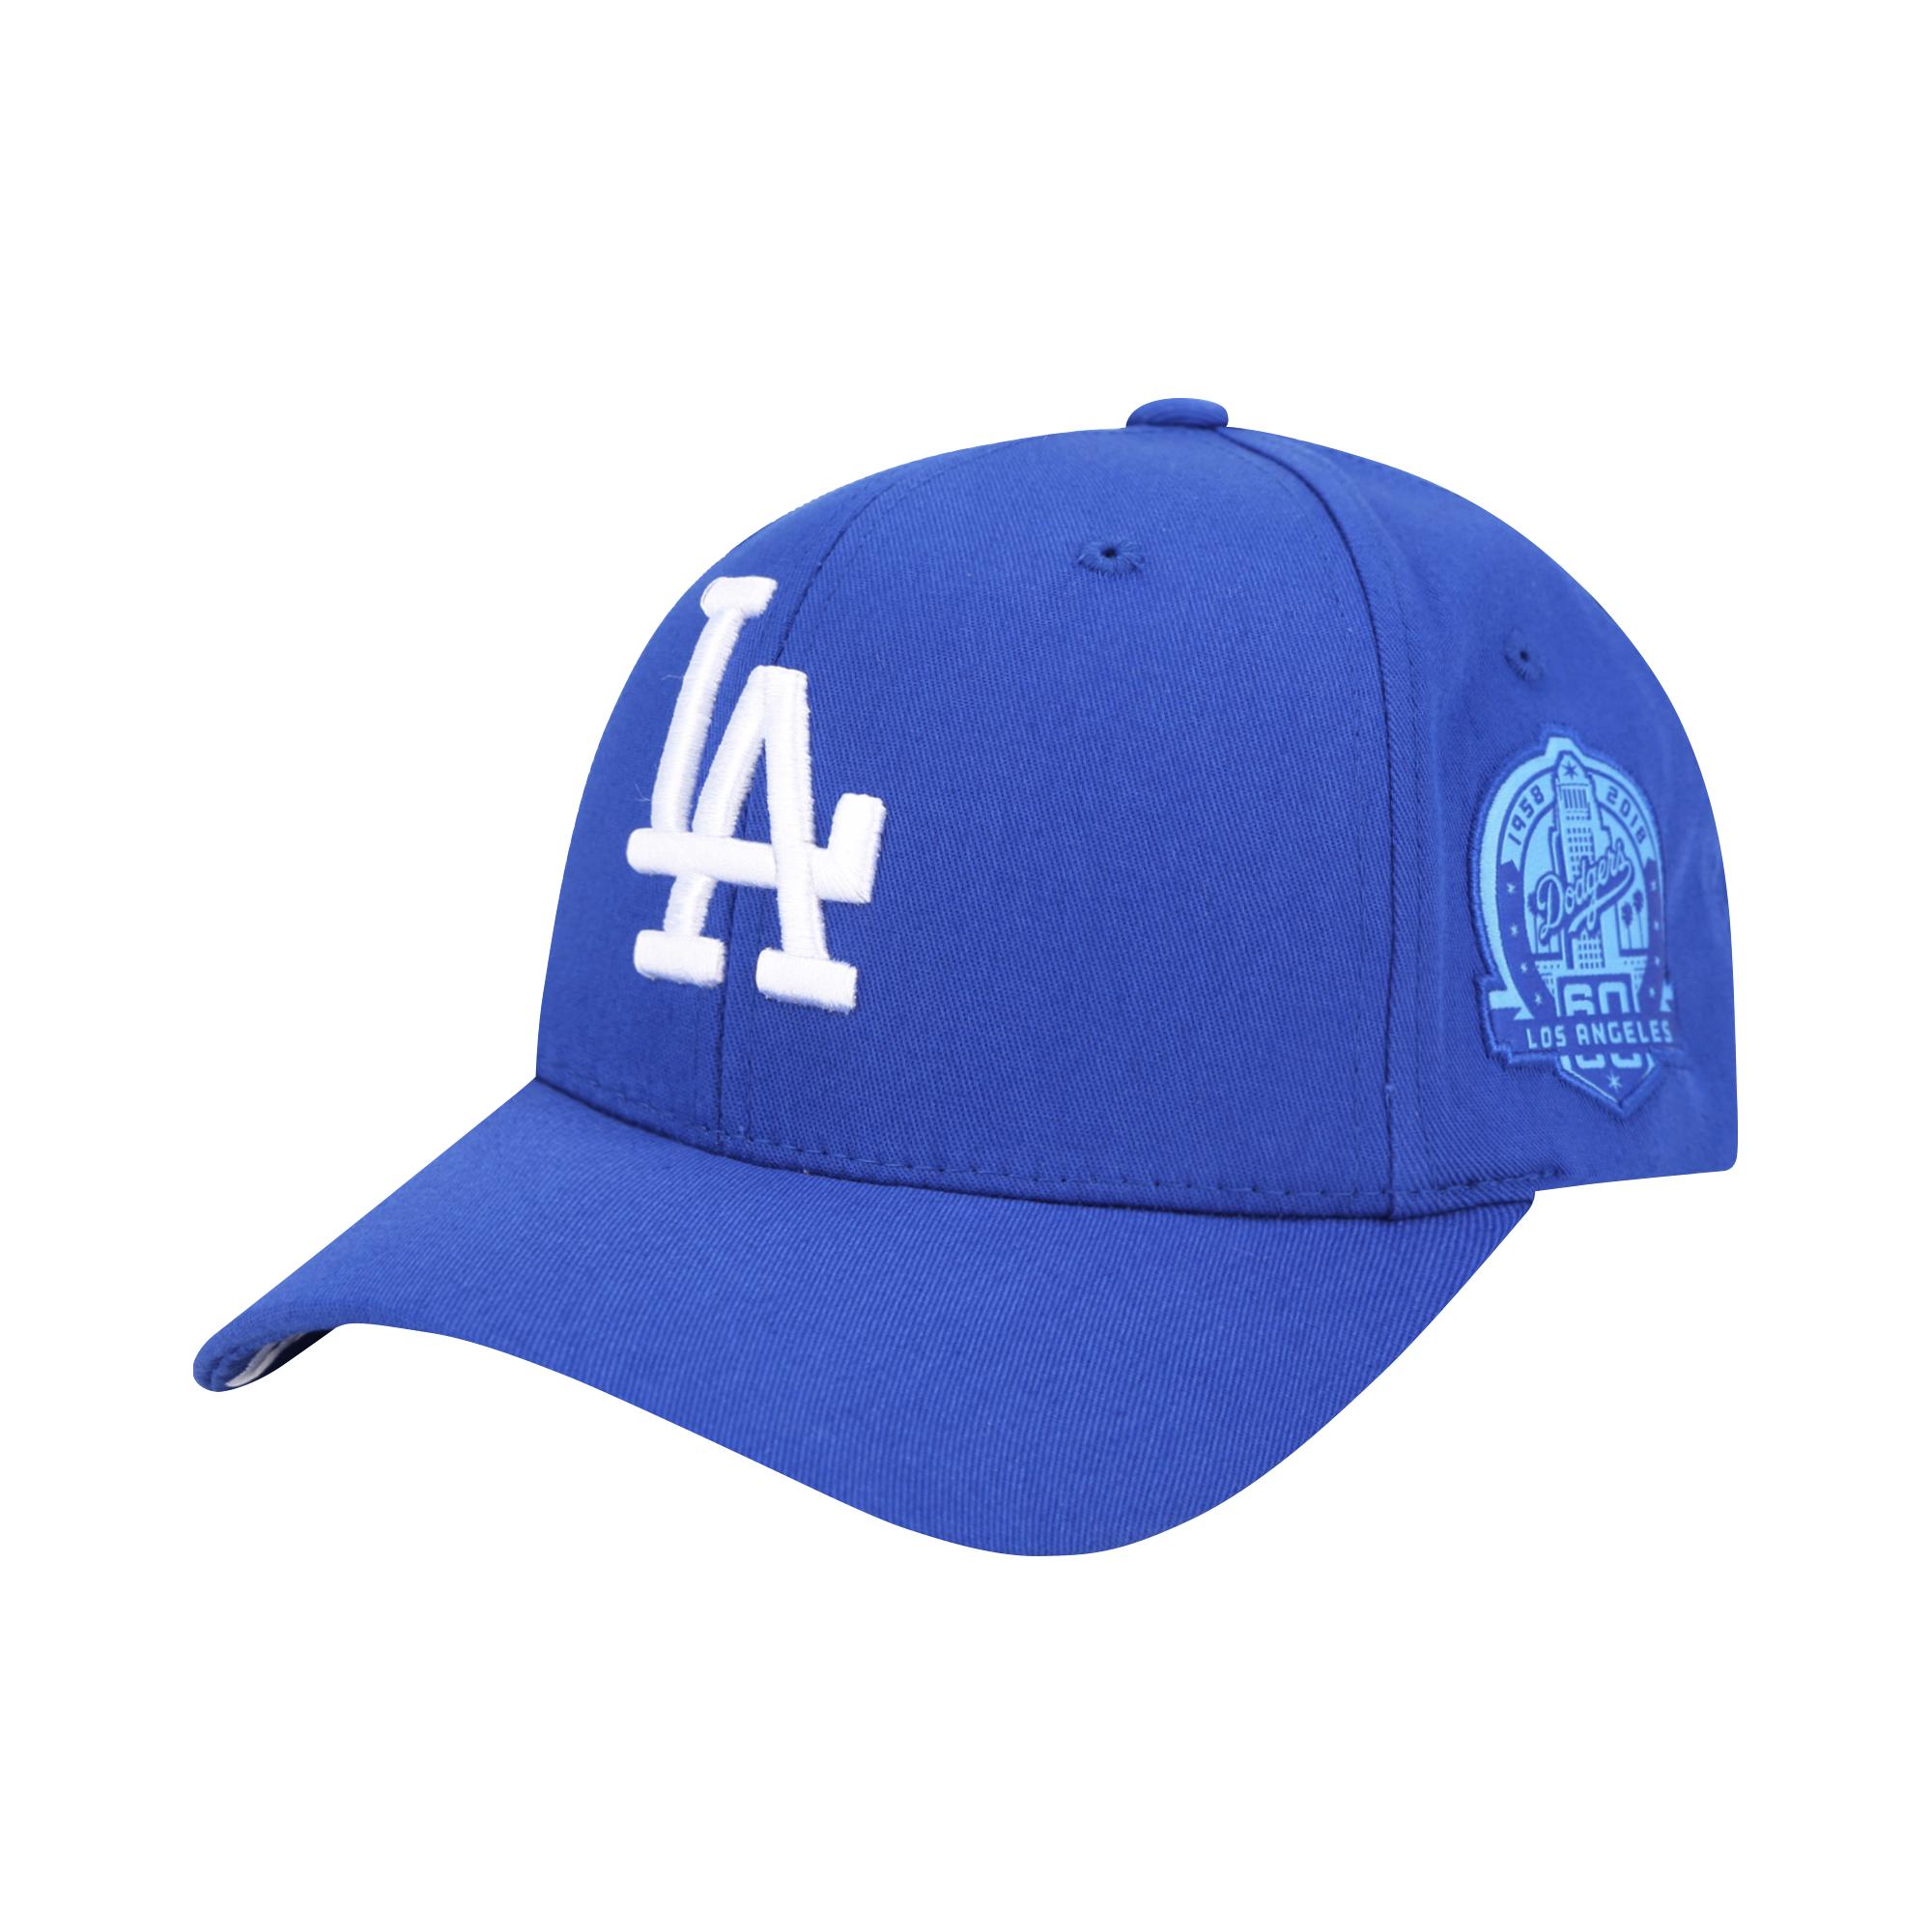 LA DODGERS ROUND PATCH CURVED CAP